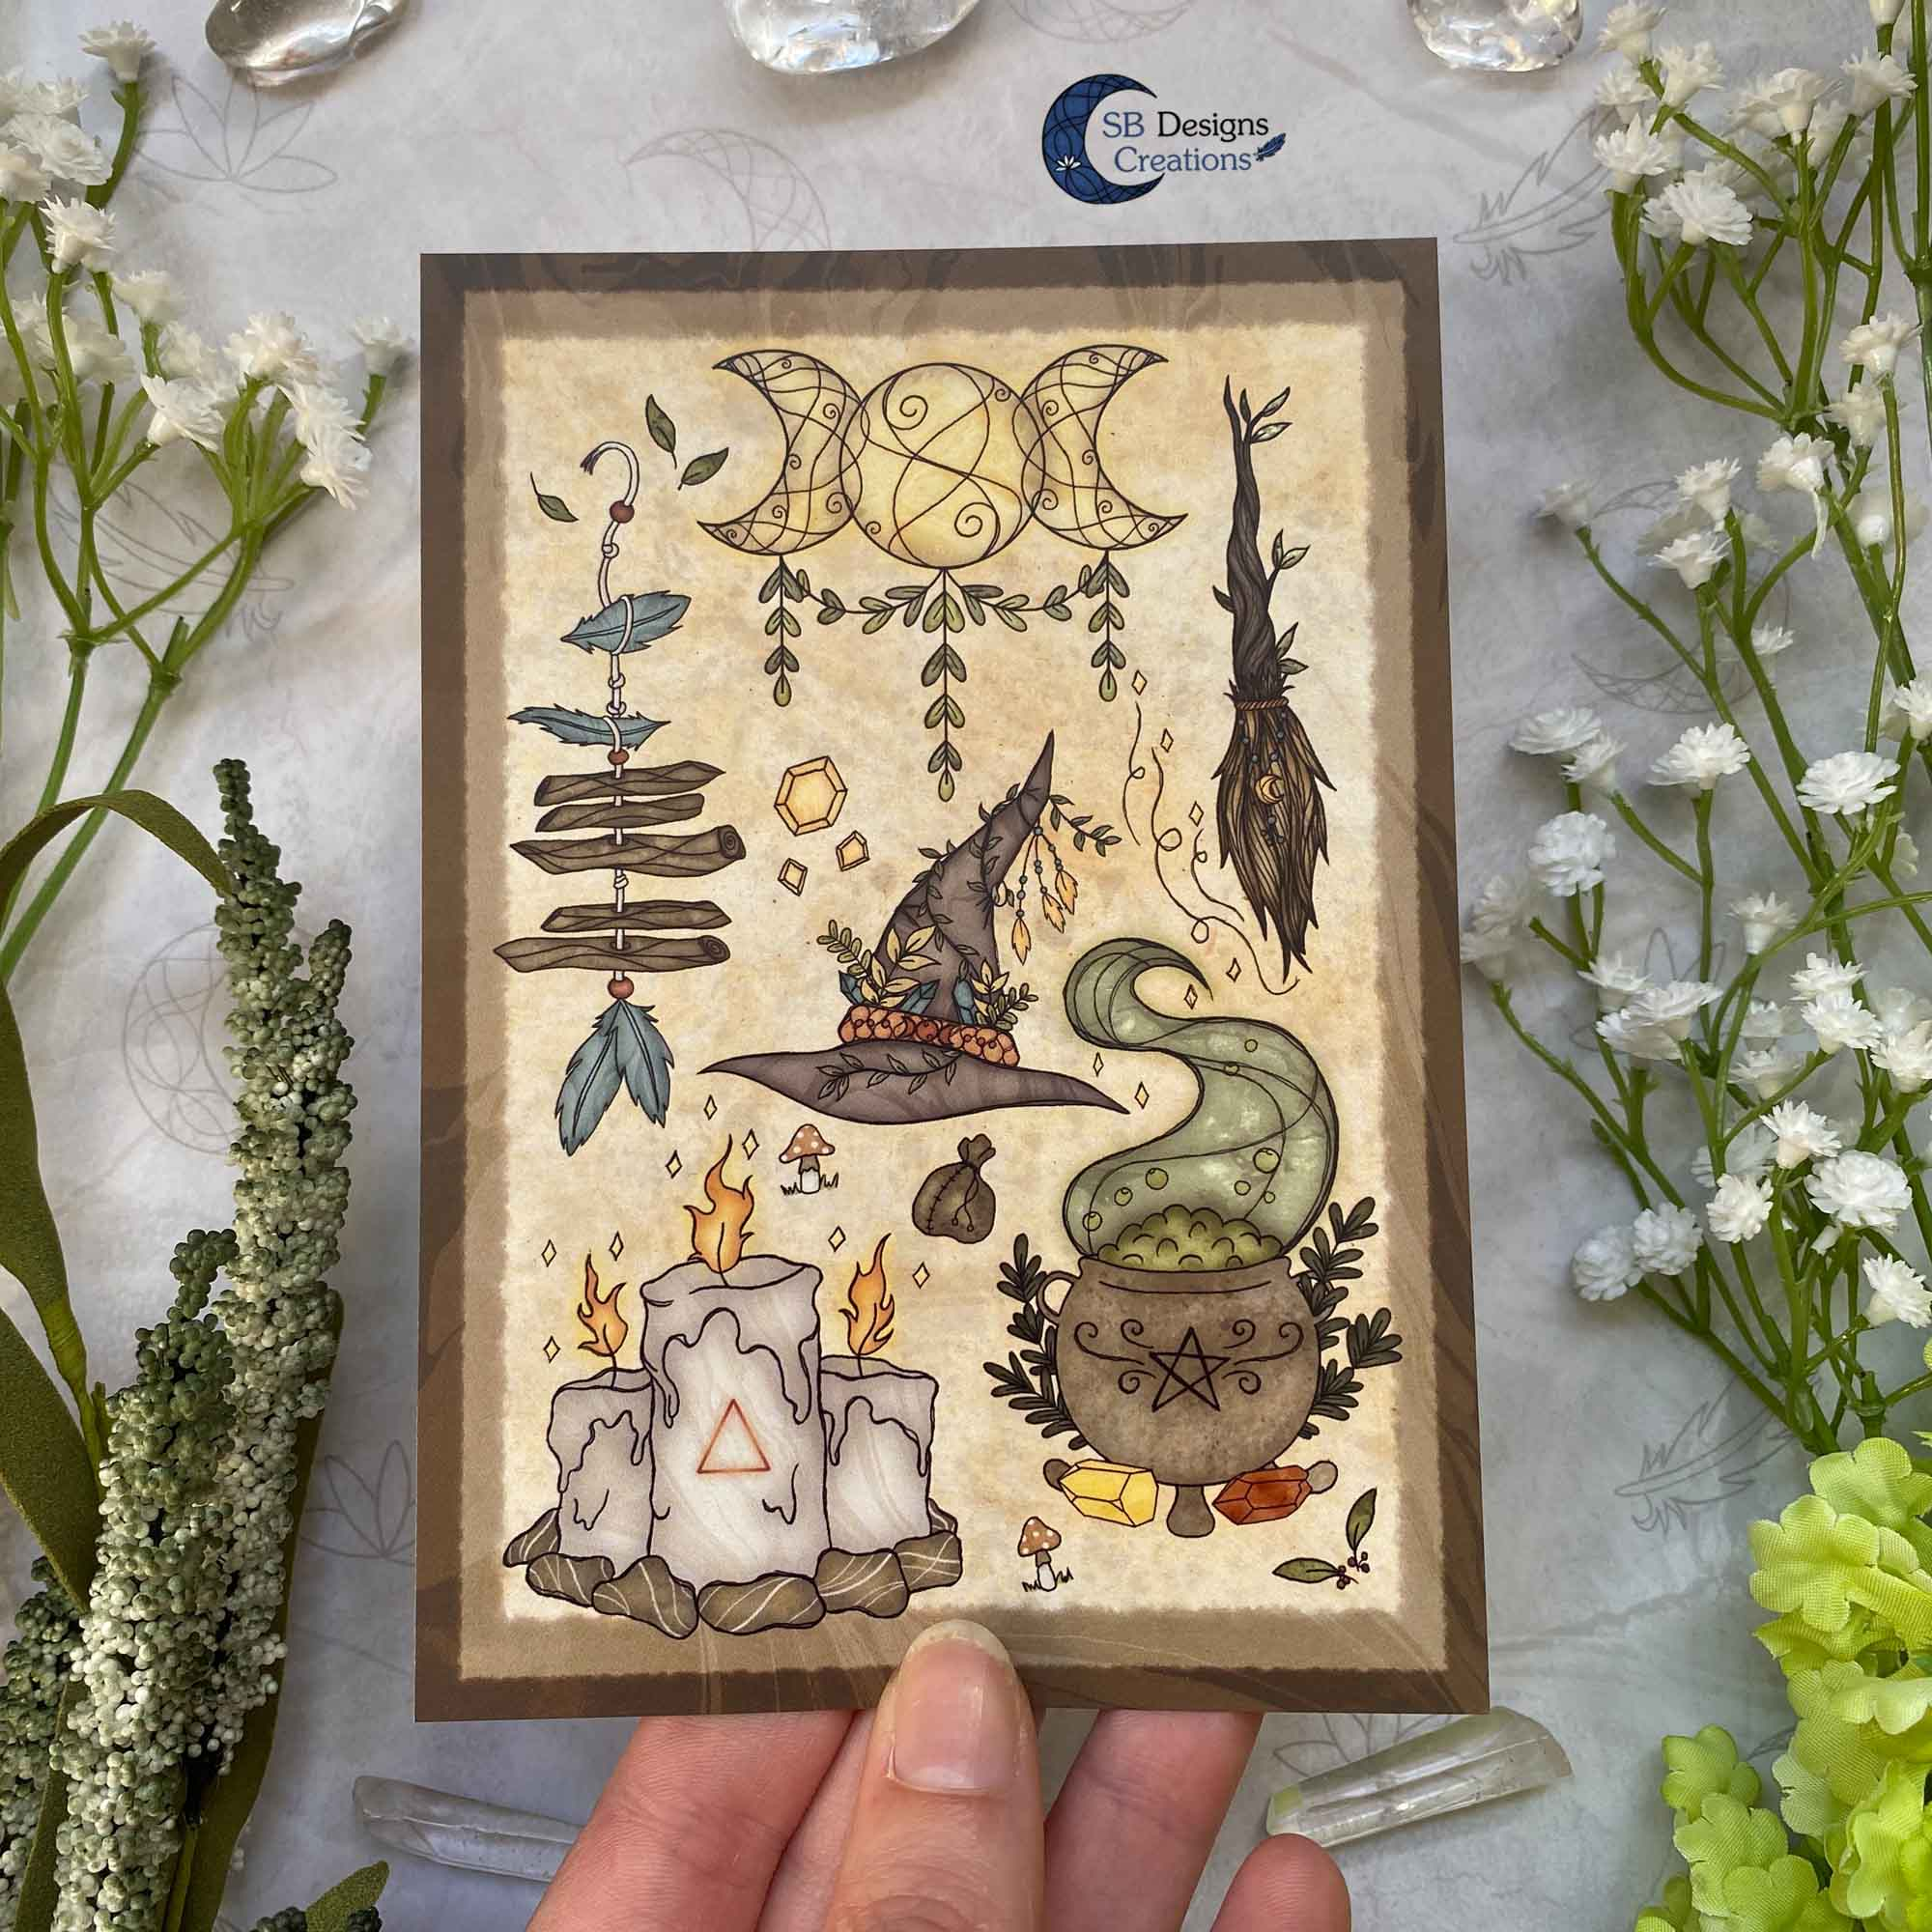 Heks Ansichtkaarten Witchy Vibes heksenhoed Bezem Triple Moon Vuurmagie Cauldron Art-7